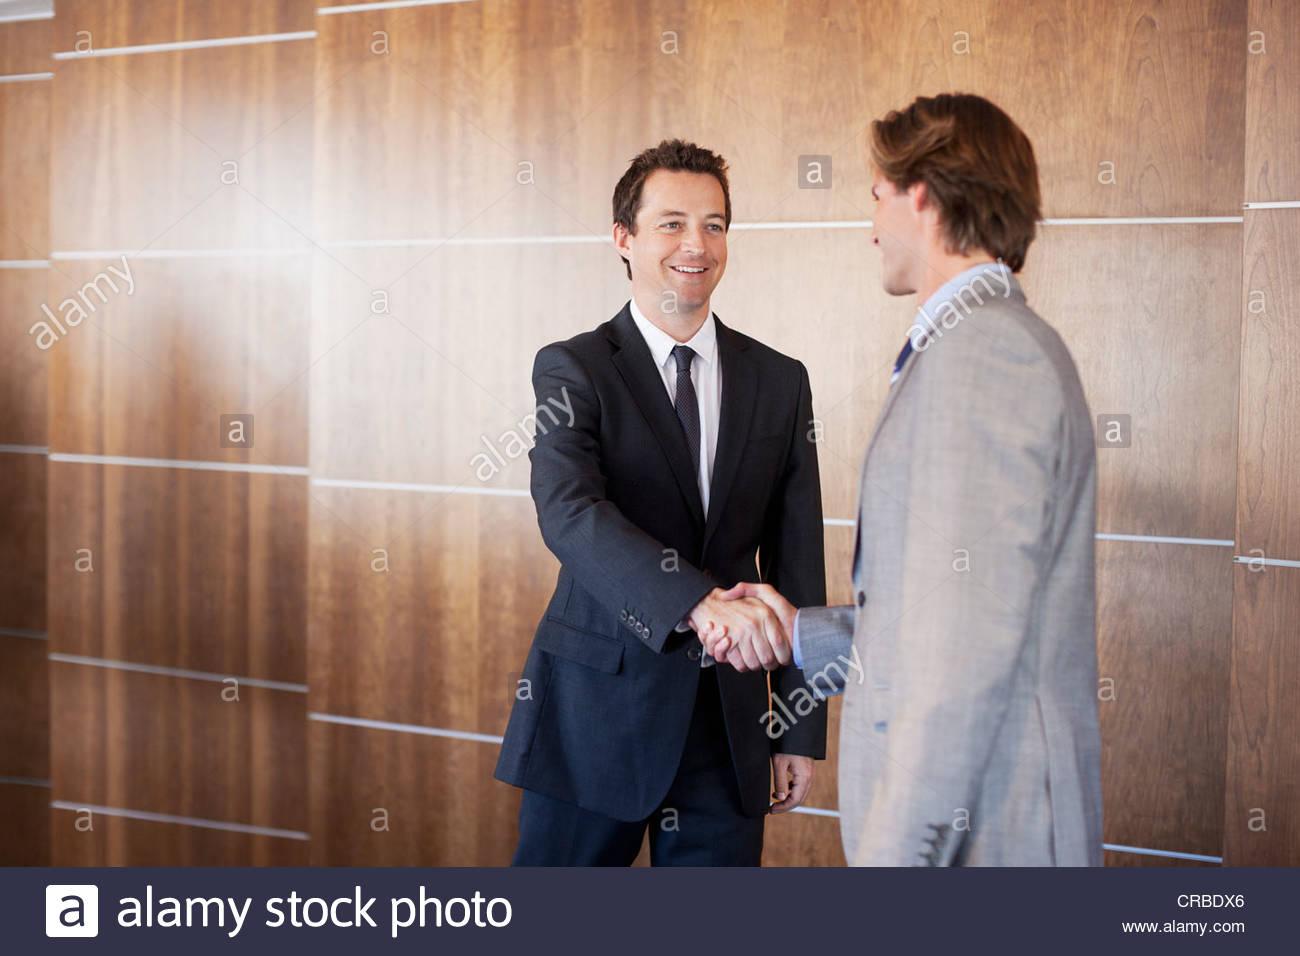 Smiling businessmen shaking hands - Stock Image